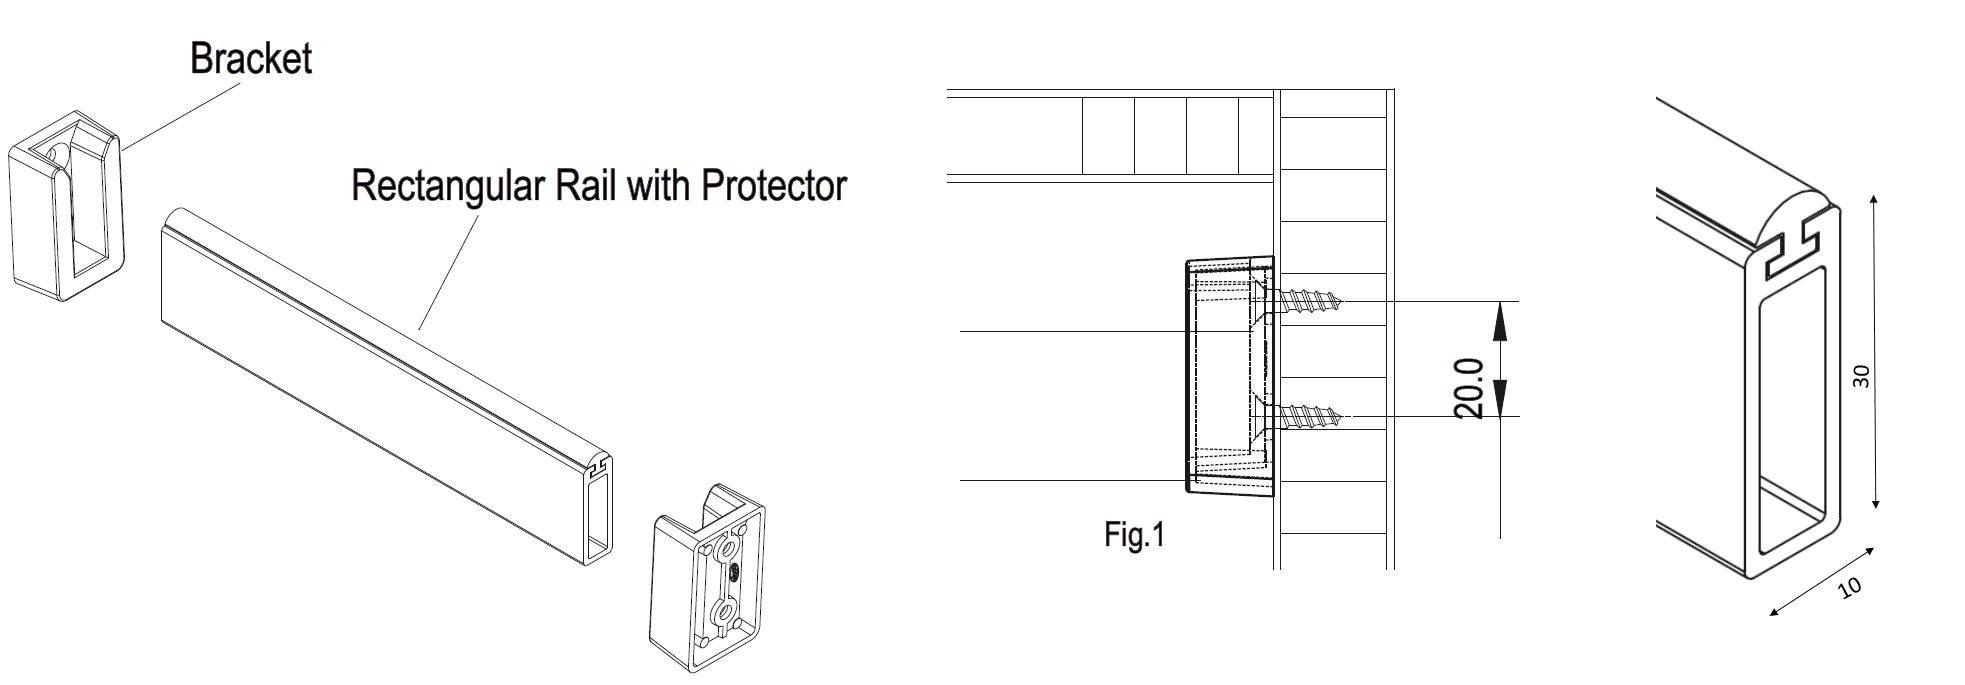 wardrobe rail fittings rectangular. Black Bedroom Furniture Sets. Home Design Ideas